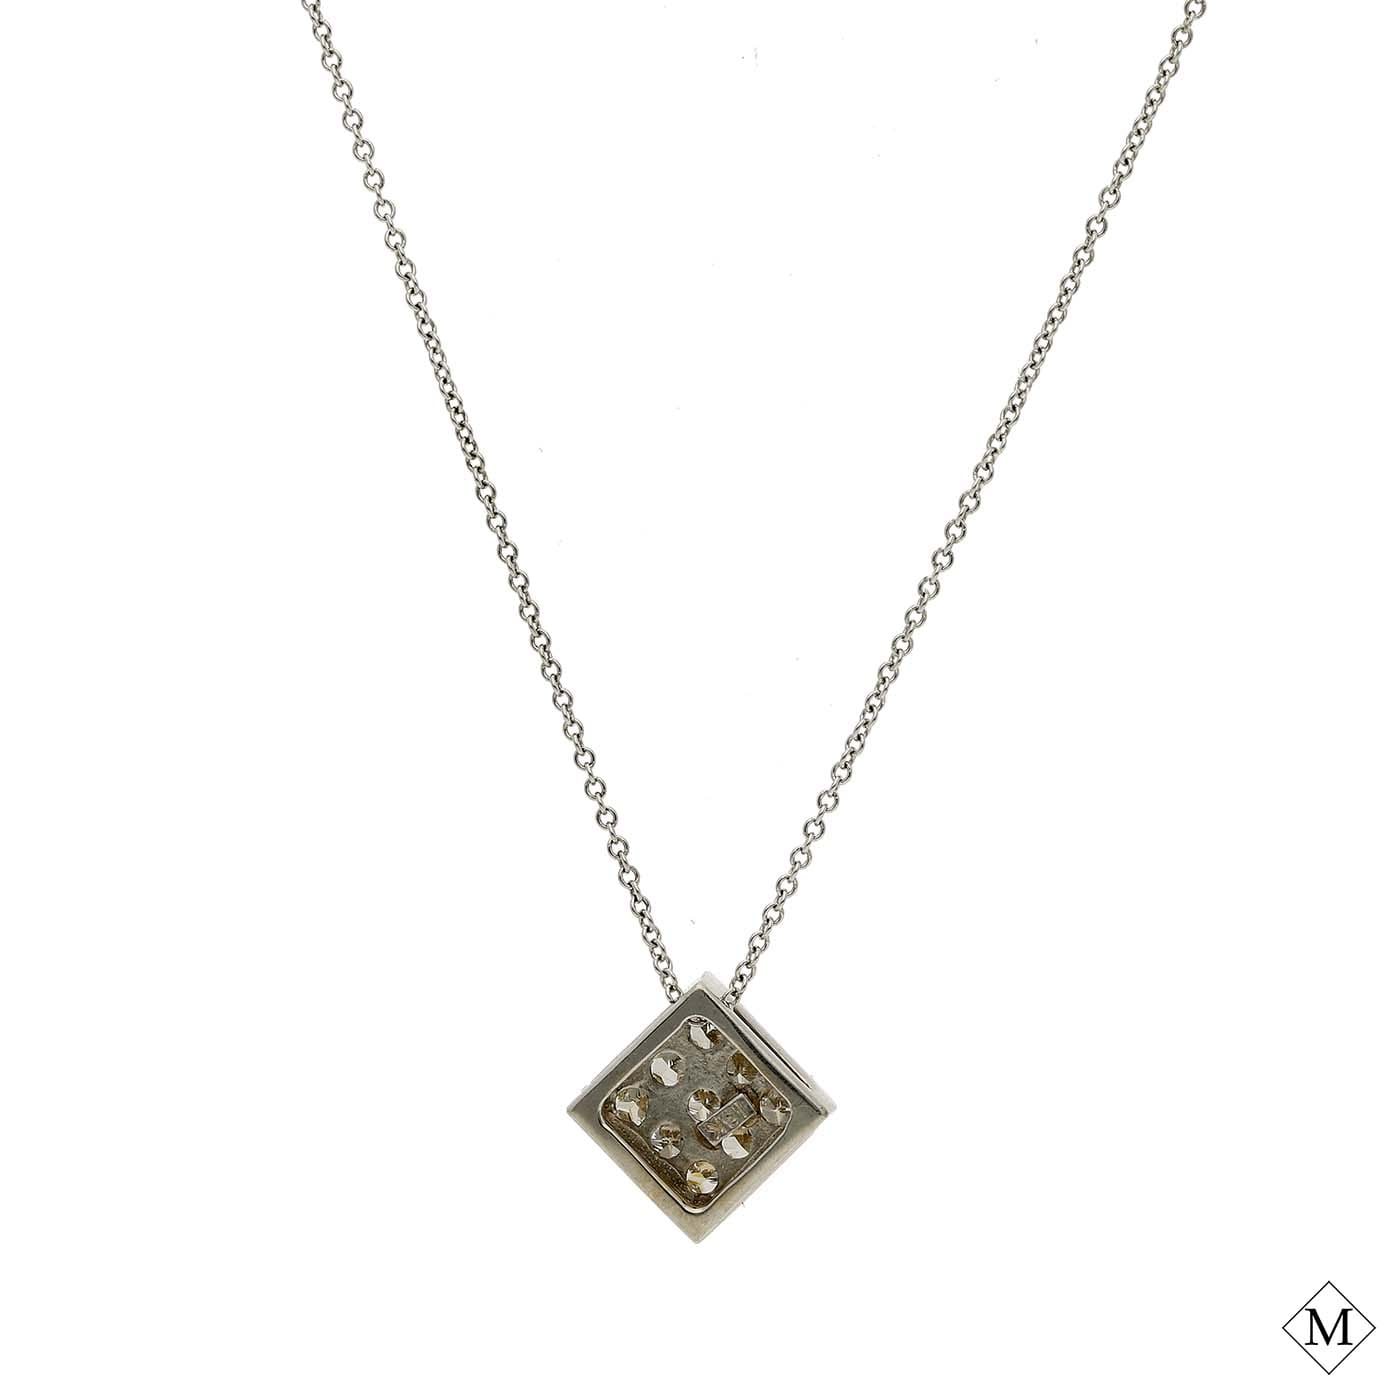 Classic Diamond PendantStyle #: PD-LQ477P